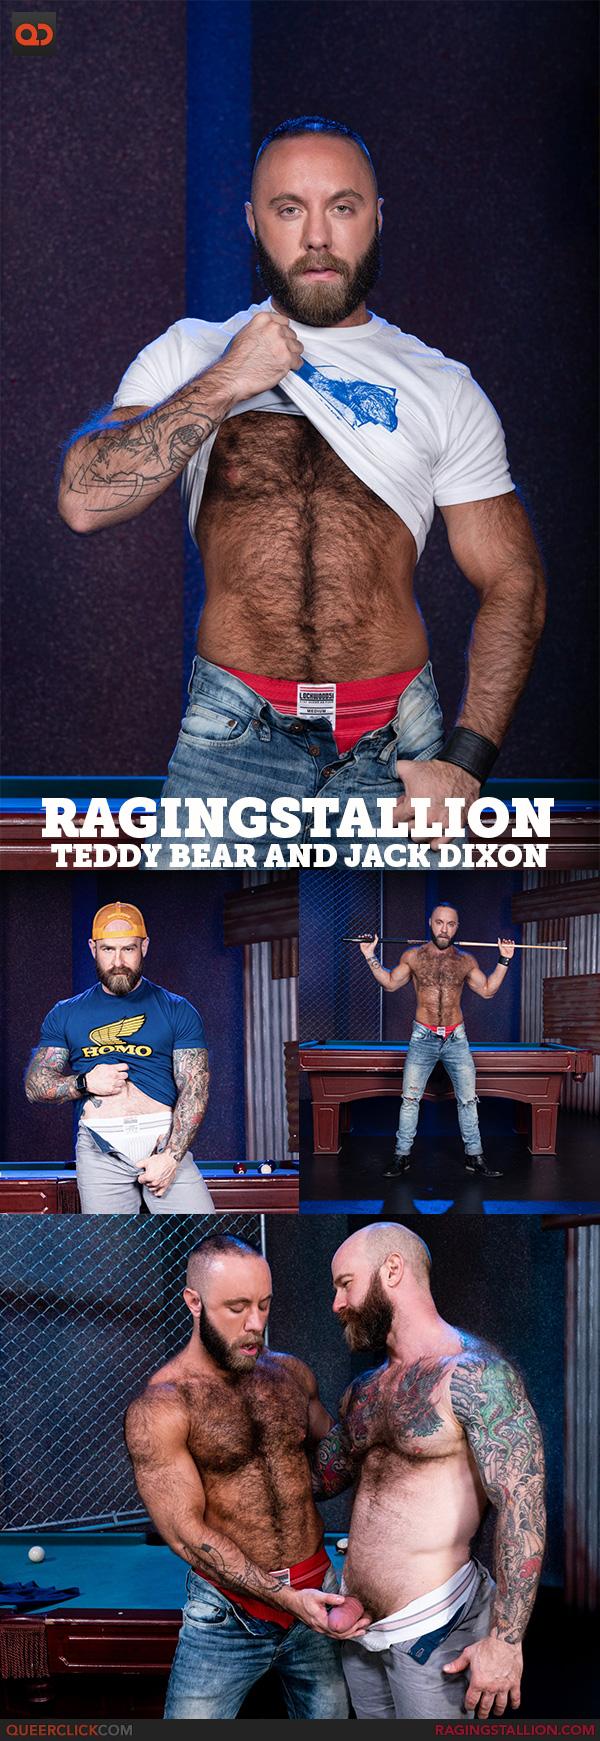 Raging Stallion:  Teddy Bear and Jack Dixon